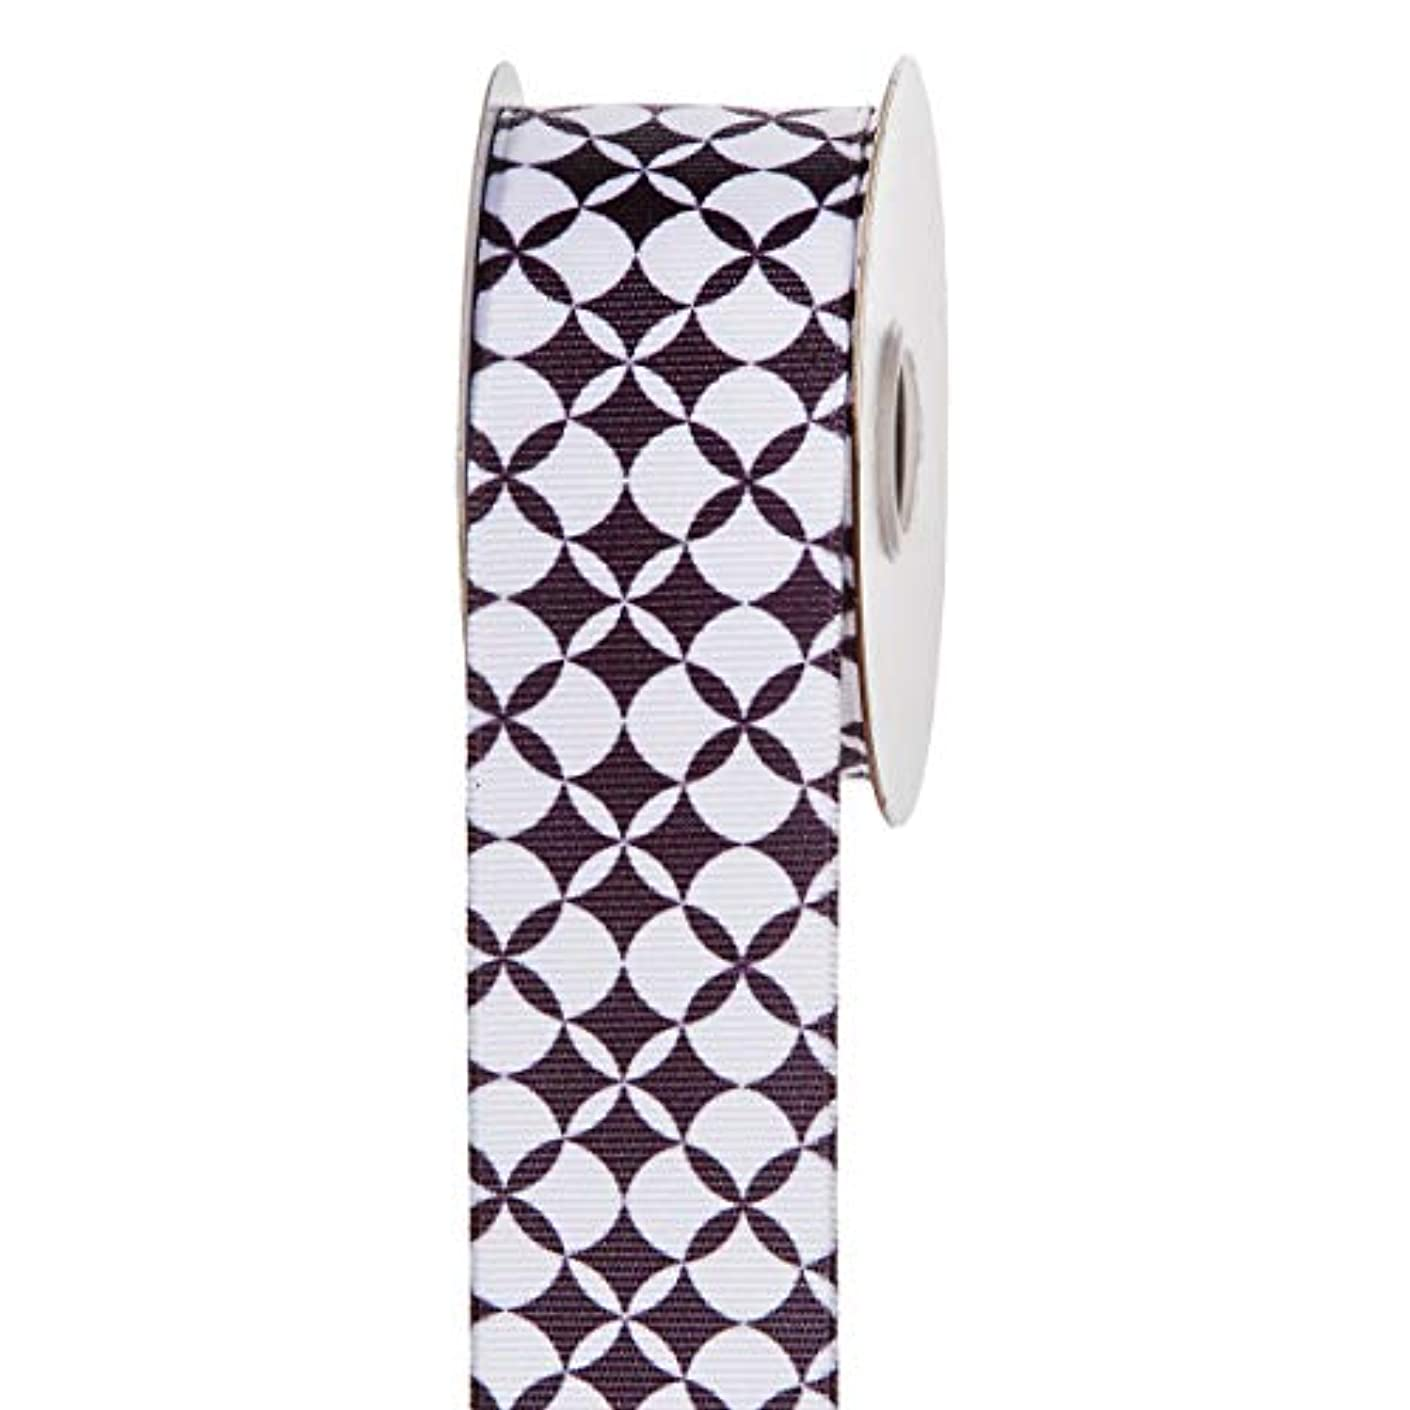 Darice Black & White Retro Flower Patterned Ribbon: 1-1/2 inch x 10 yards